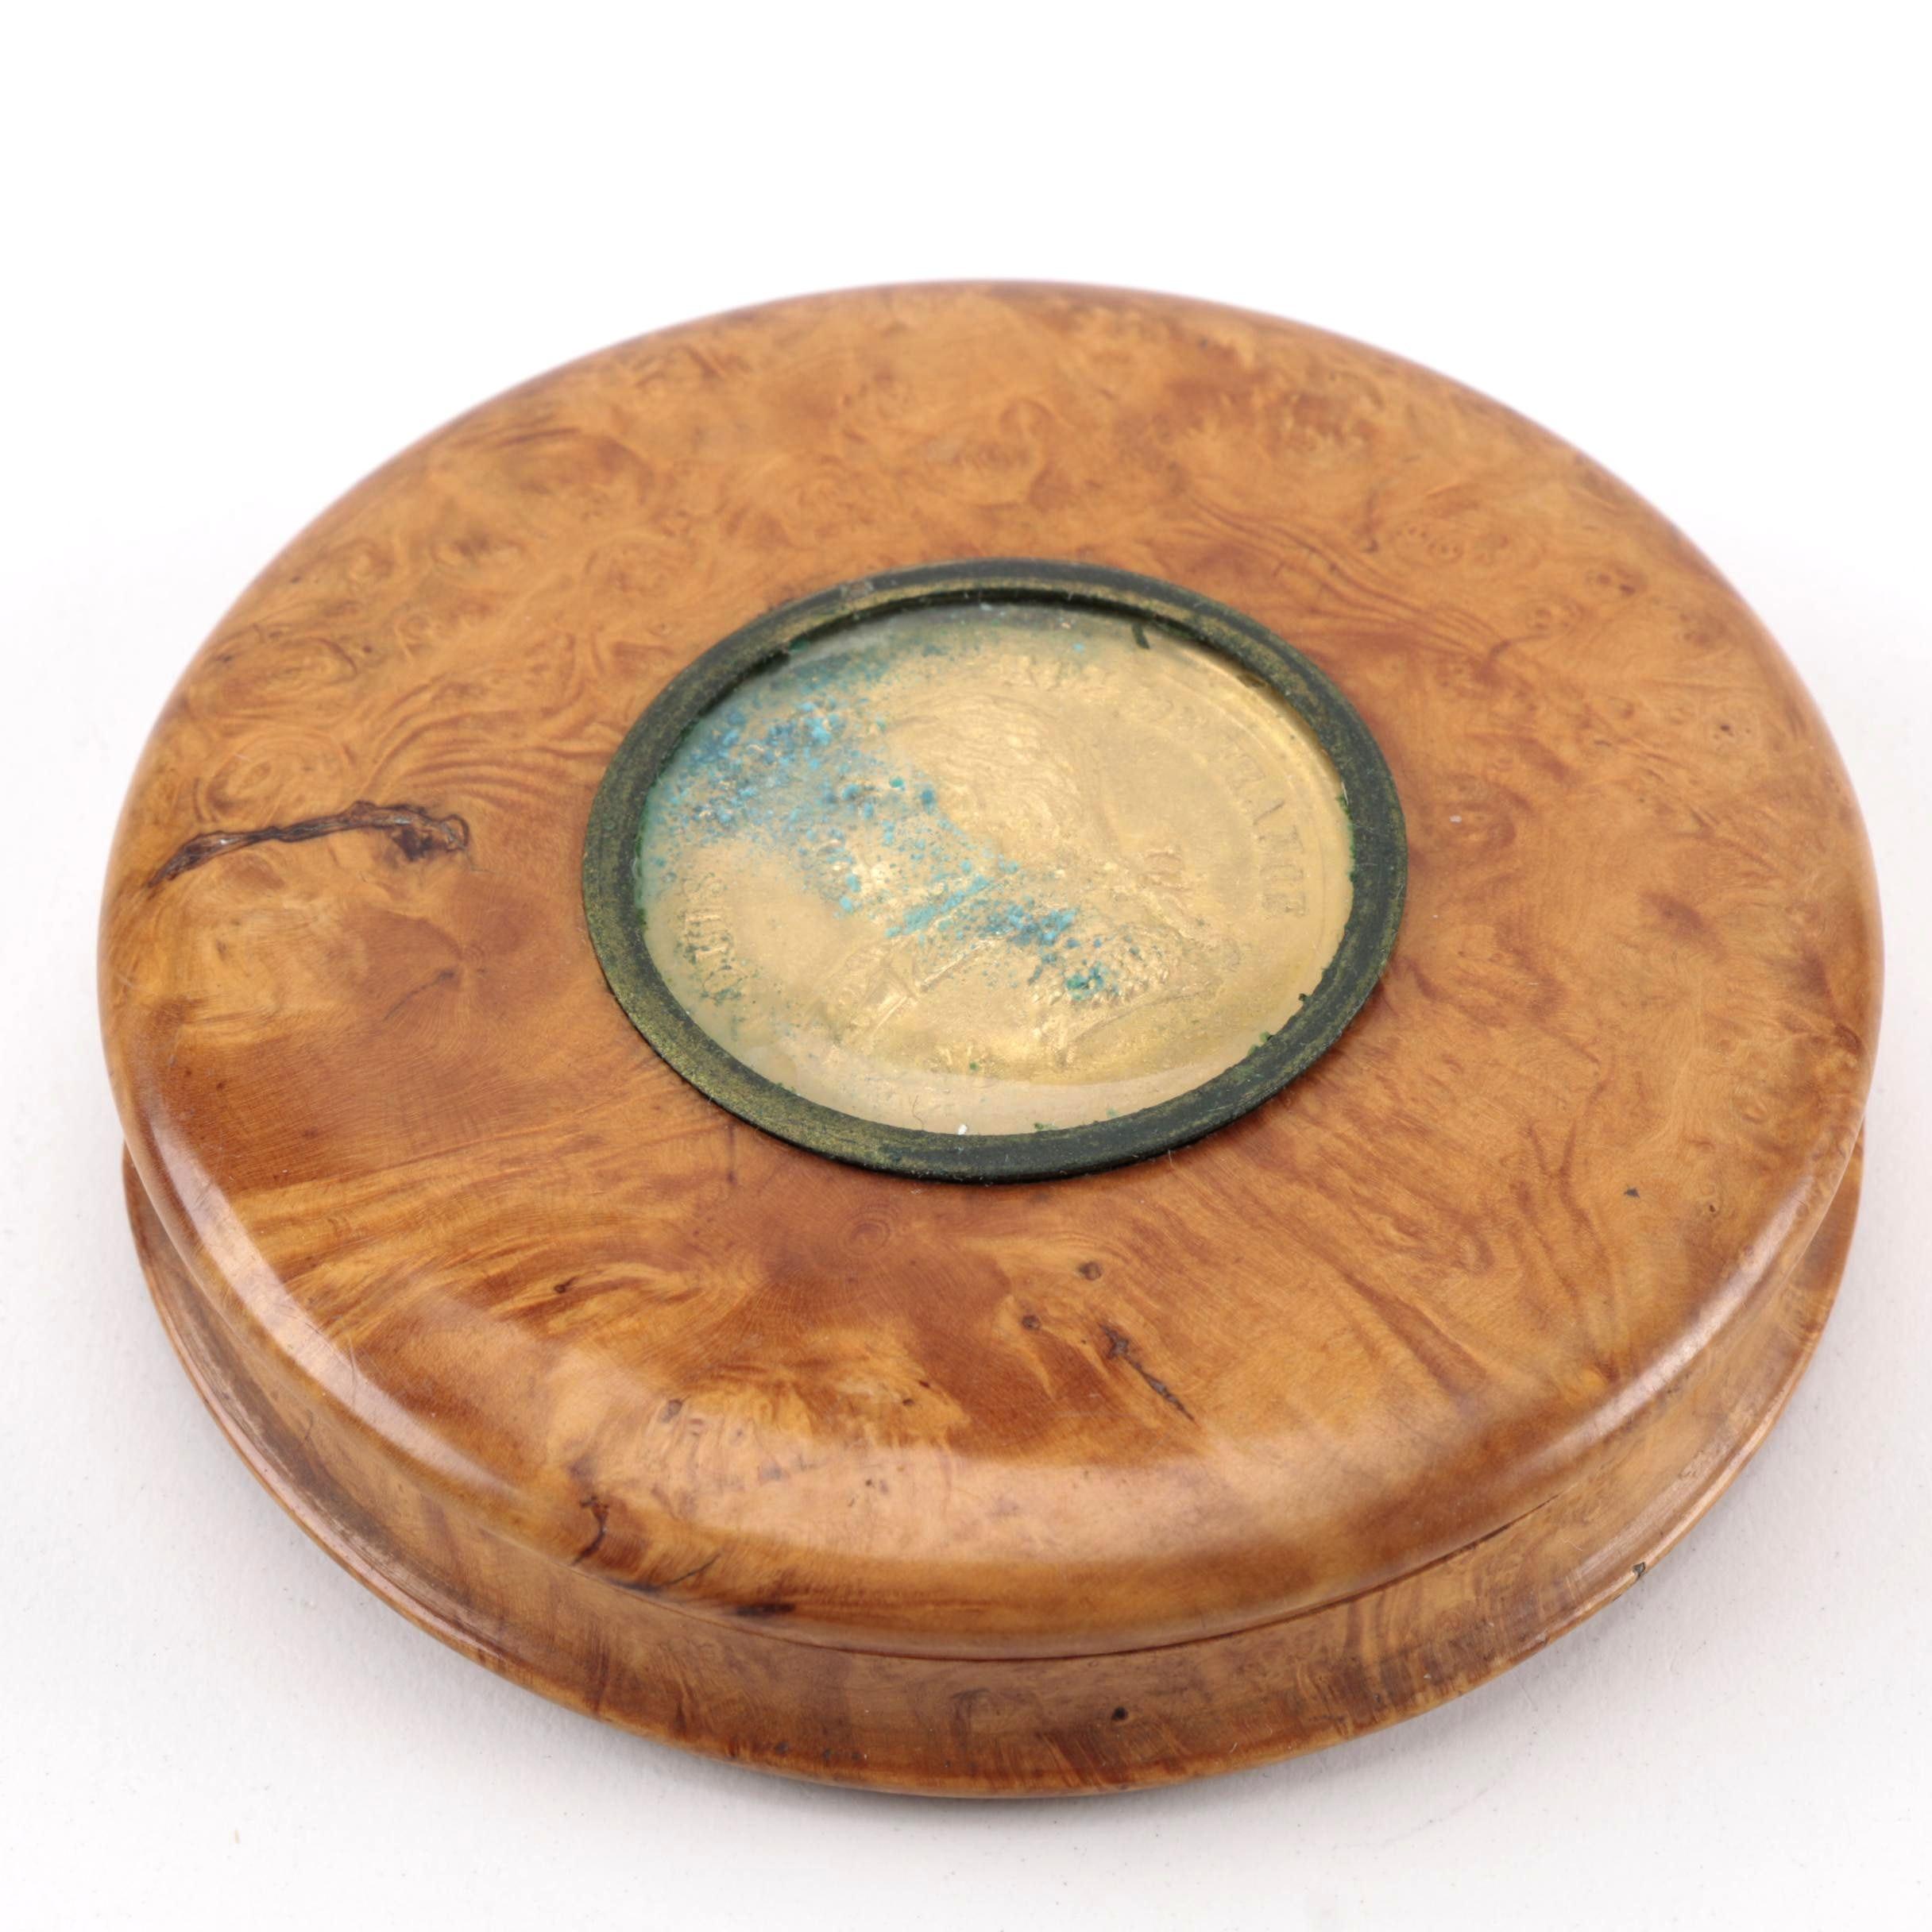 19th-Century Birdseye Maple Snuff Box With Tortoise Shell Insert